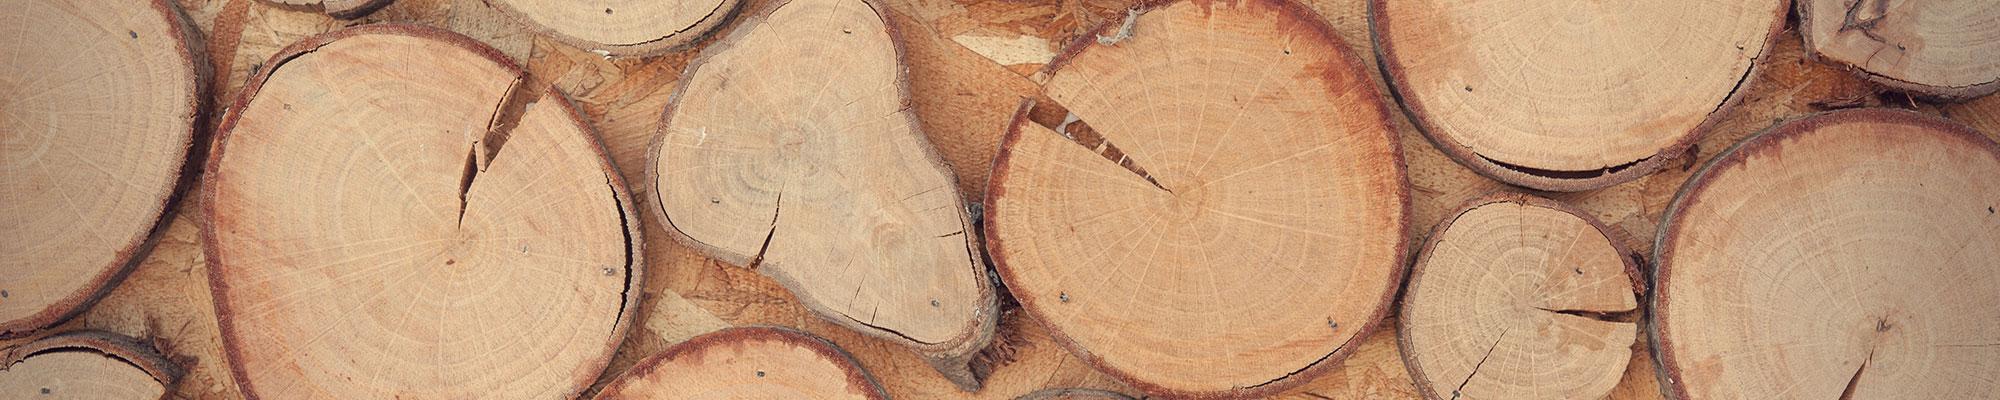 Charleston Woodworking School Education